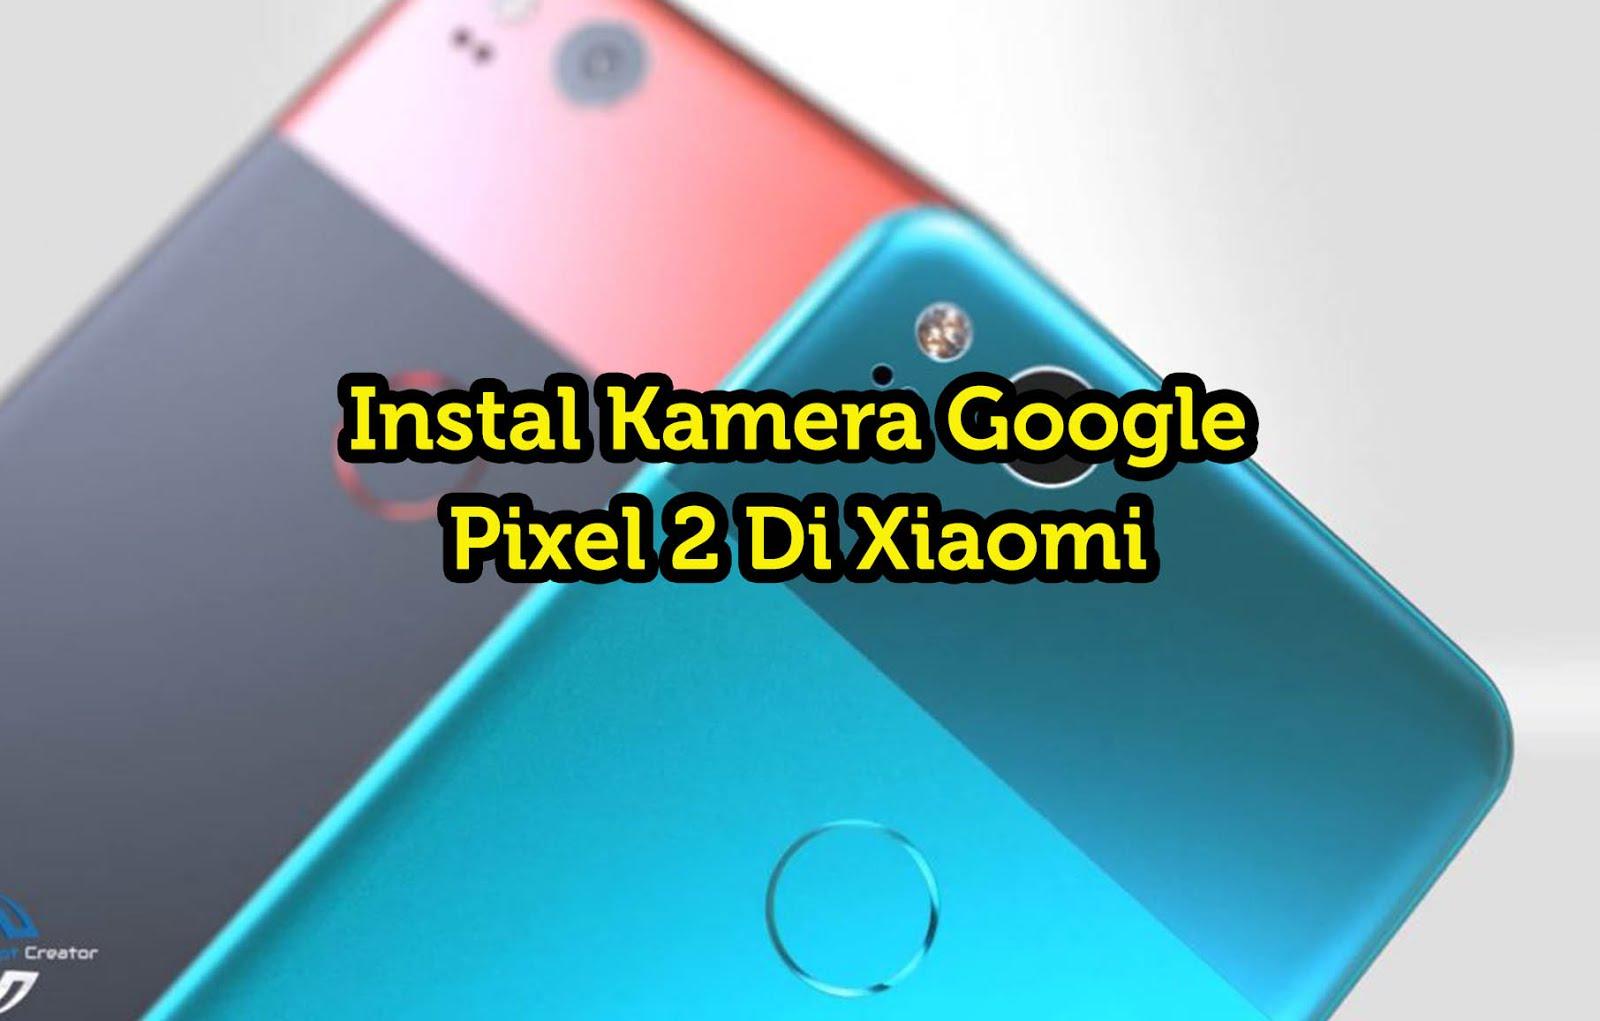 Cara Unlock Hdr Pubg Timi: Cara Install Kamera Google Pixel 2 Di Xiaomi